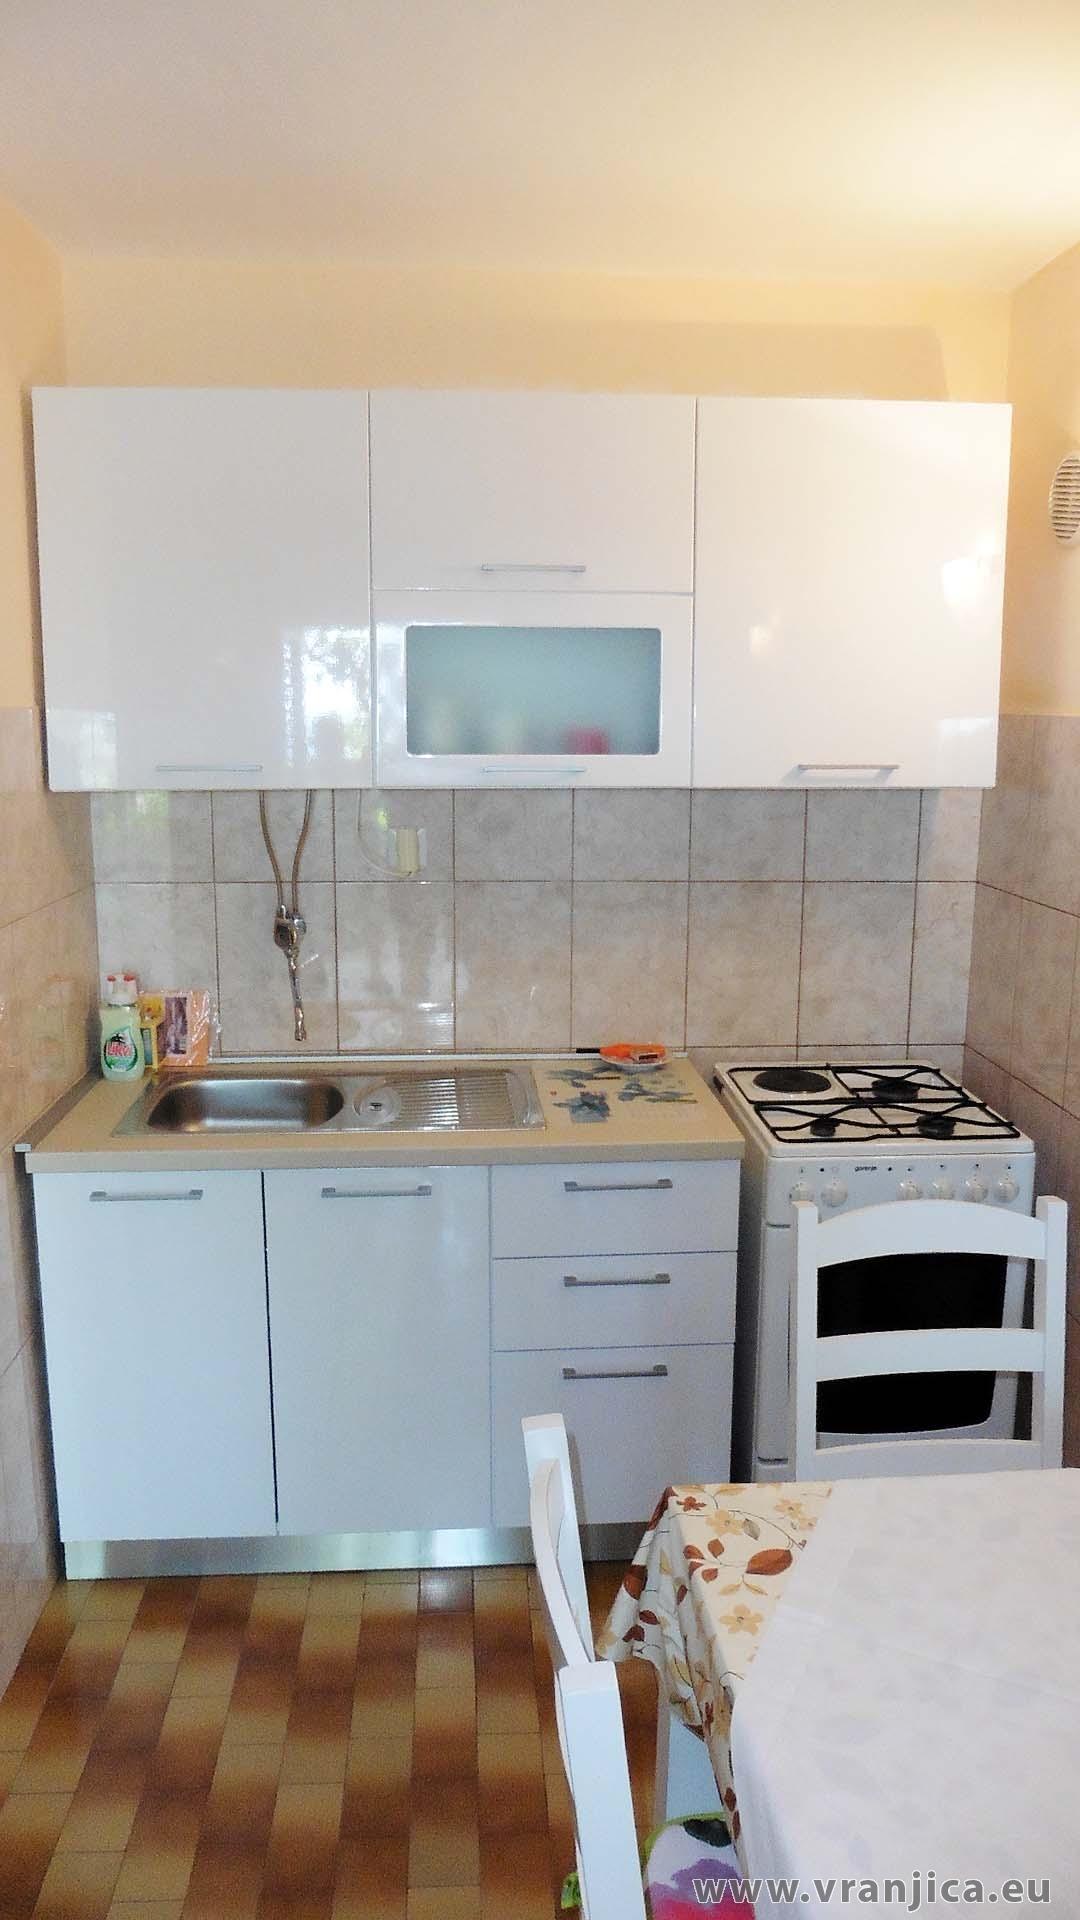 https://www.vranjica.eu/pokoje/apartman-marko-ap-dolni-3-1-1574328623L.jpg